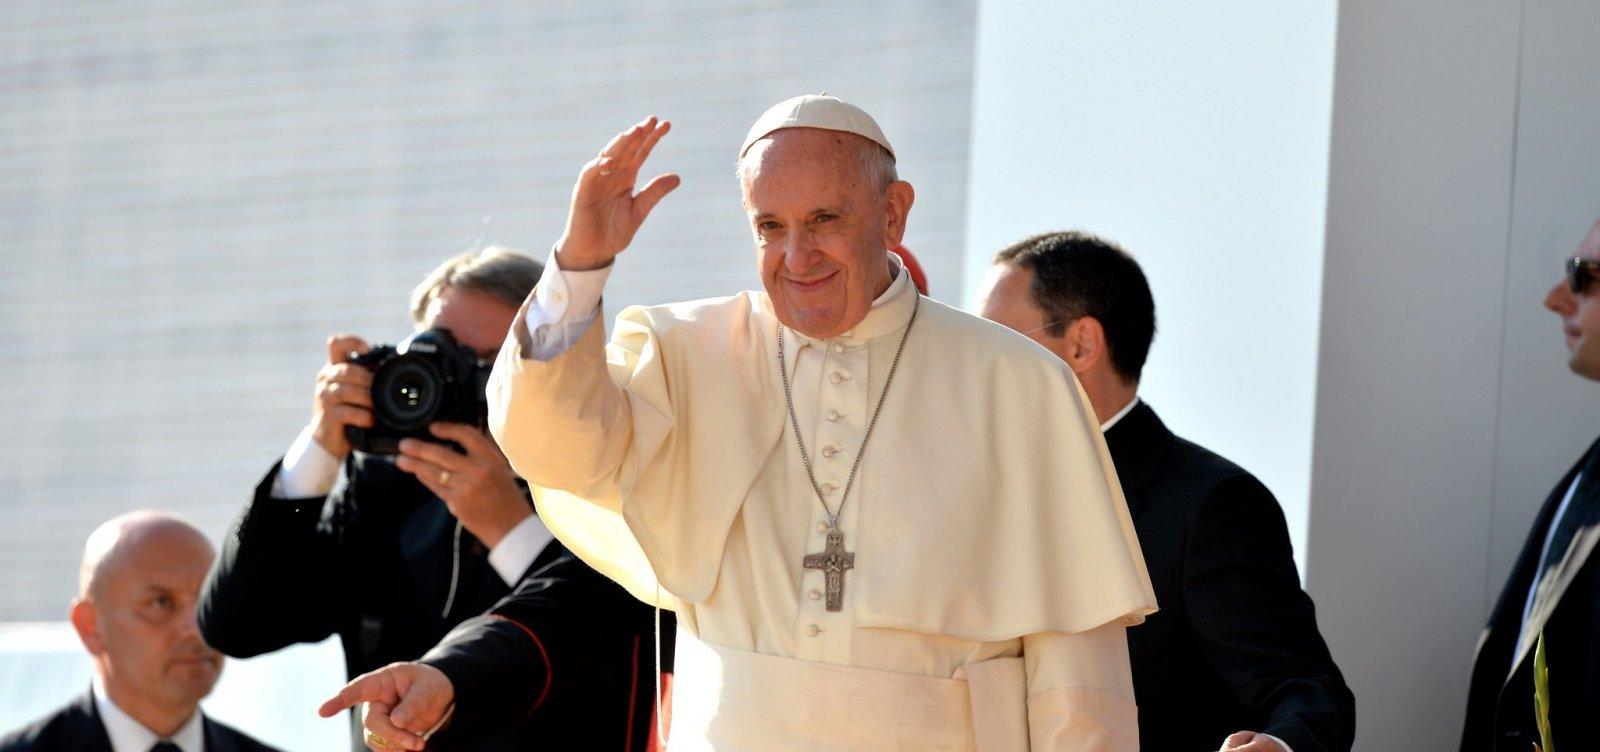 Papa expressa solidariedade aos atingidos por terremoto na Indonésia